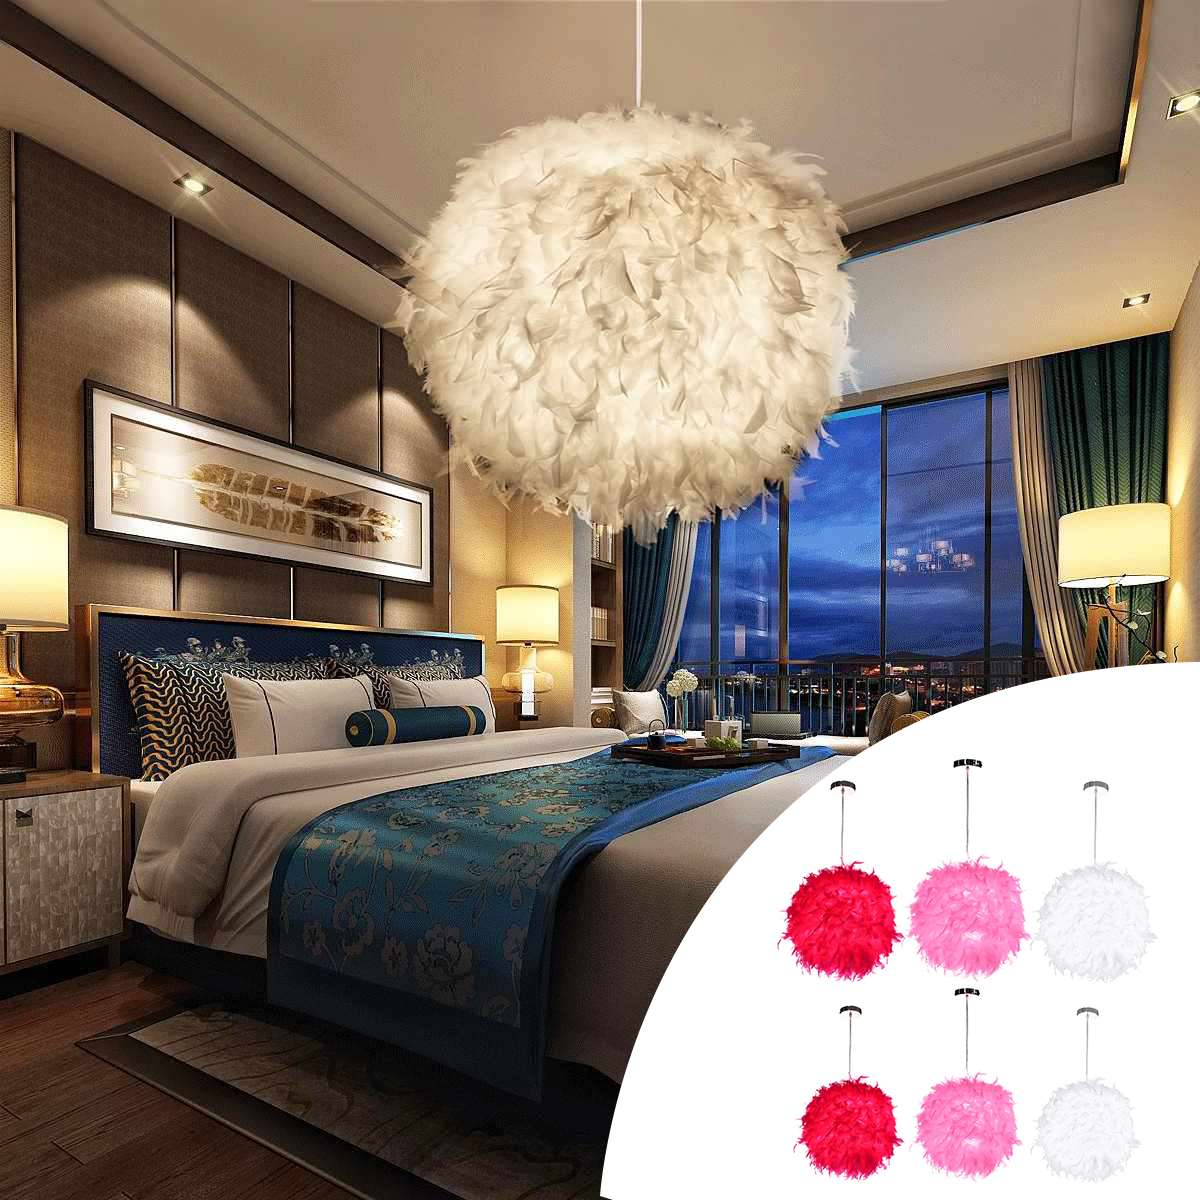 Modern Red/Pink/White 110-220V Feather Ball Lamp shade Ceiling Pendant Light Shade Bedroom Living Room E27 Soft Safe Decor